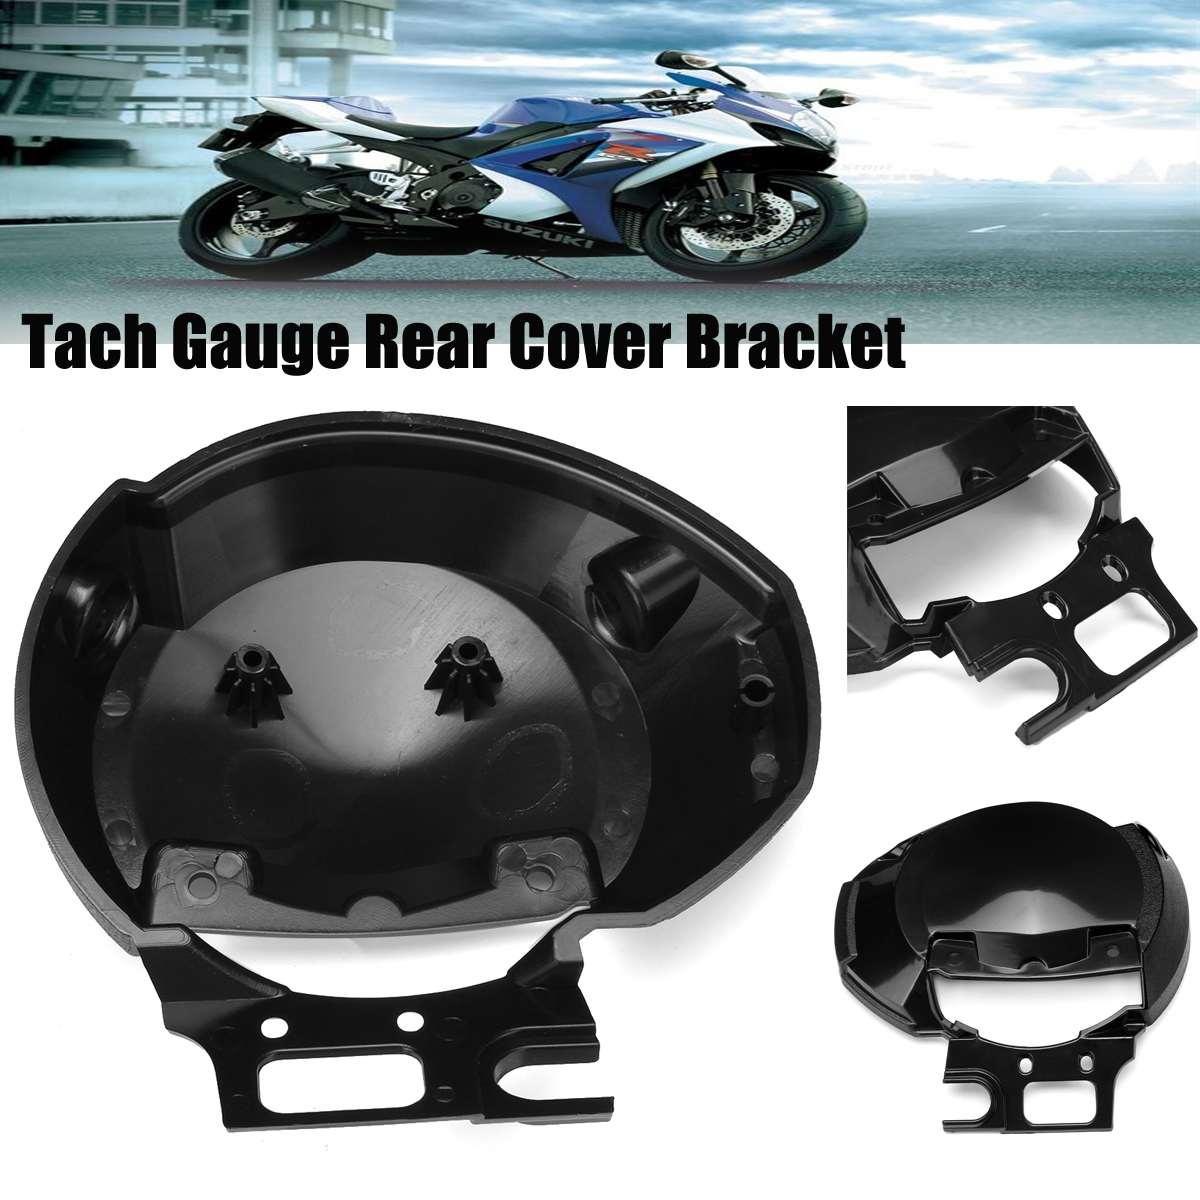 Motorcycle SpeedoMeter Speed Tach Gauge Rear Case Cover Bracket for Yamaha FZ6 N 2004-2007  Instrument meter case